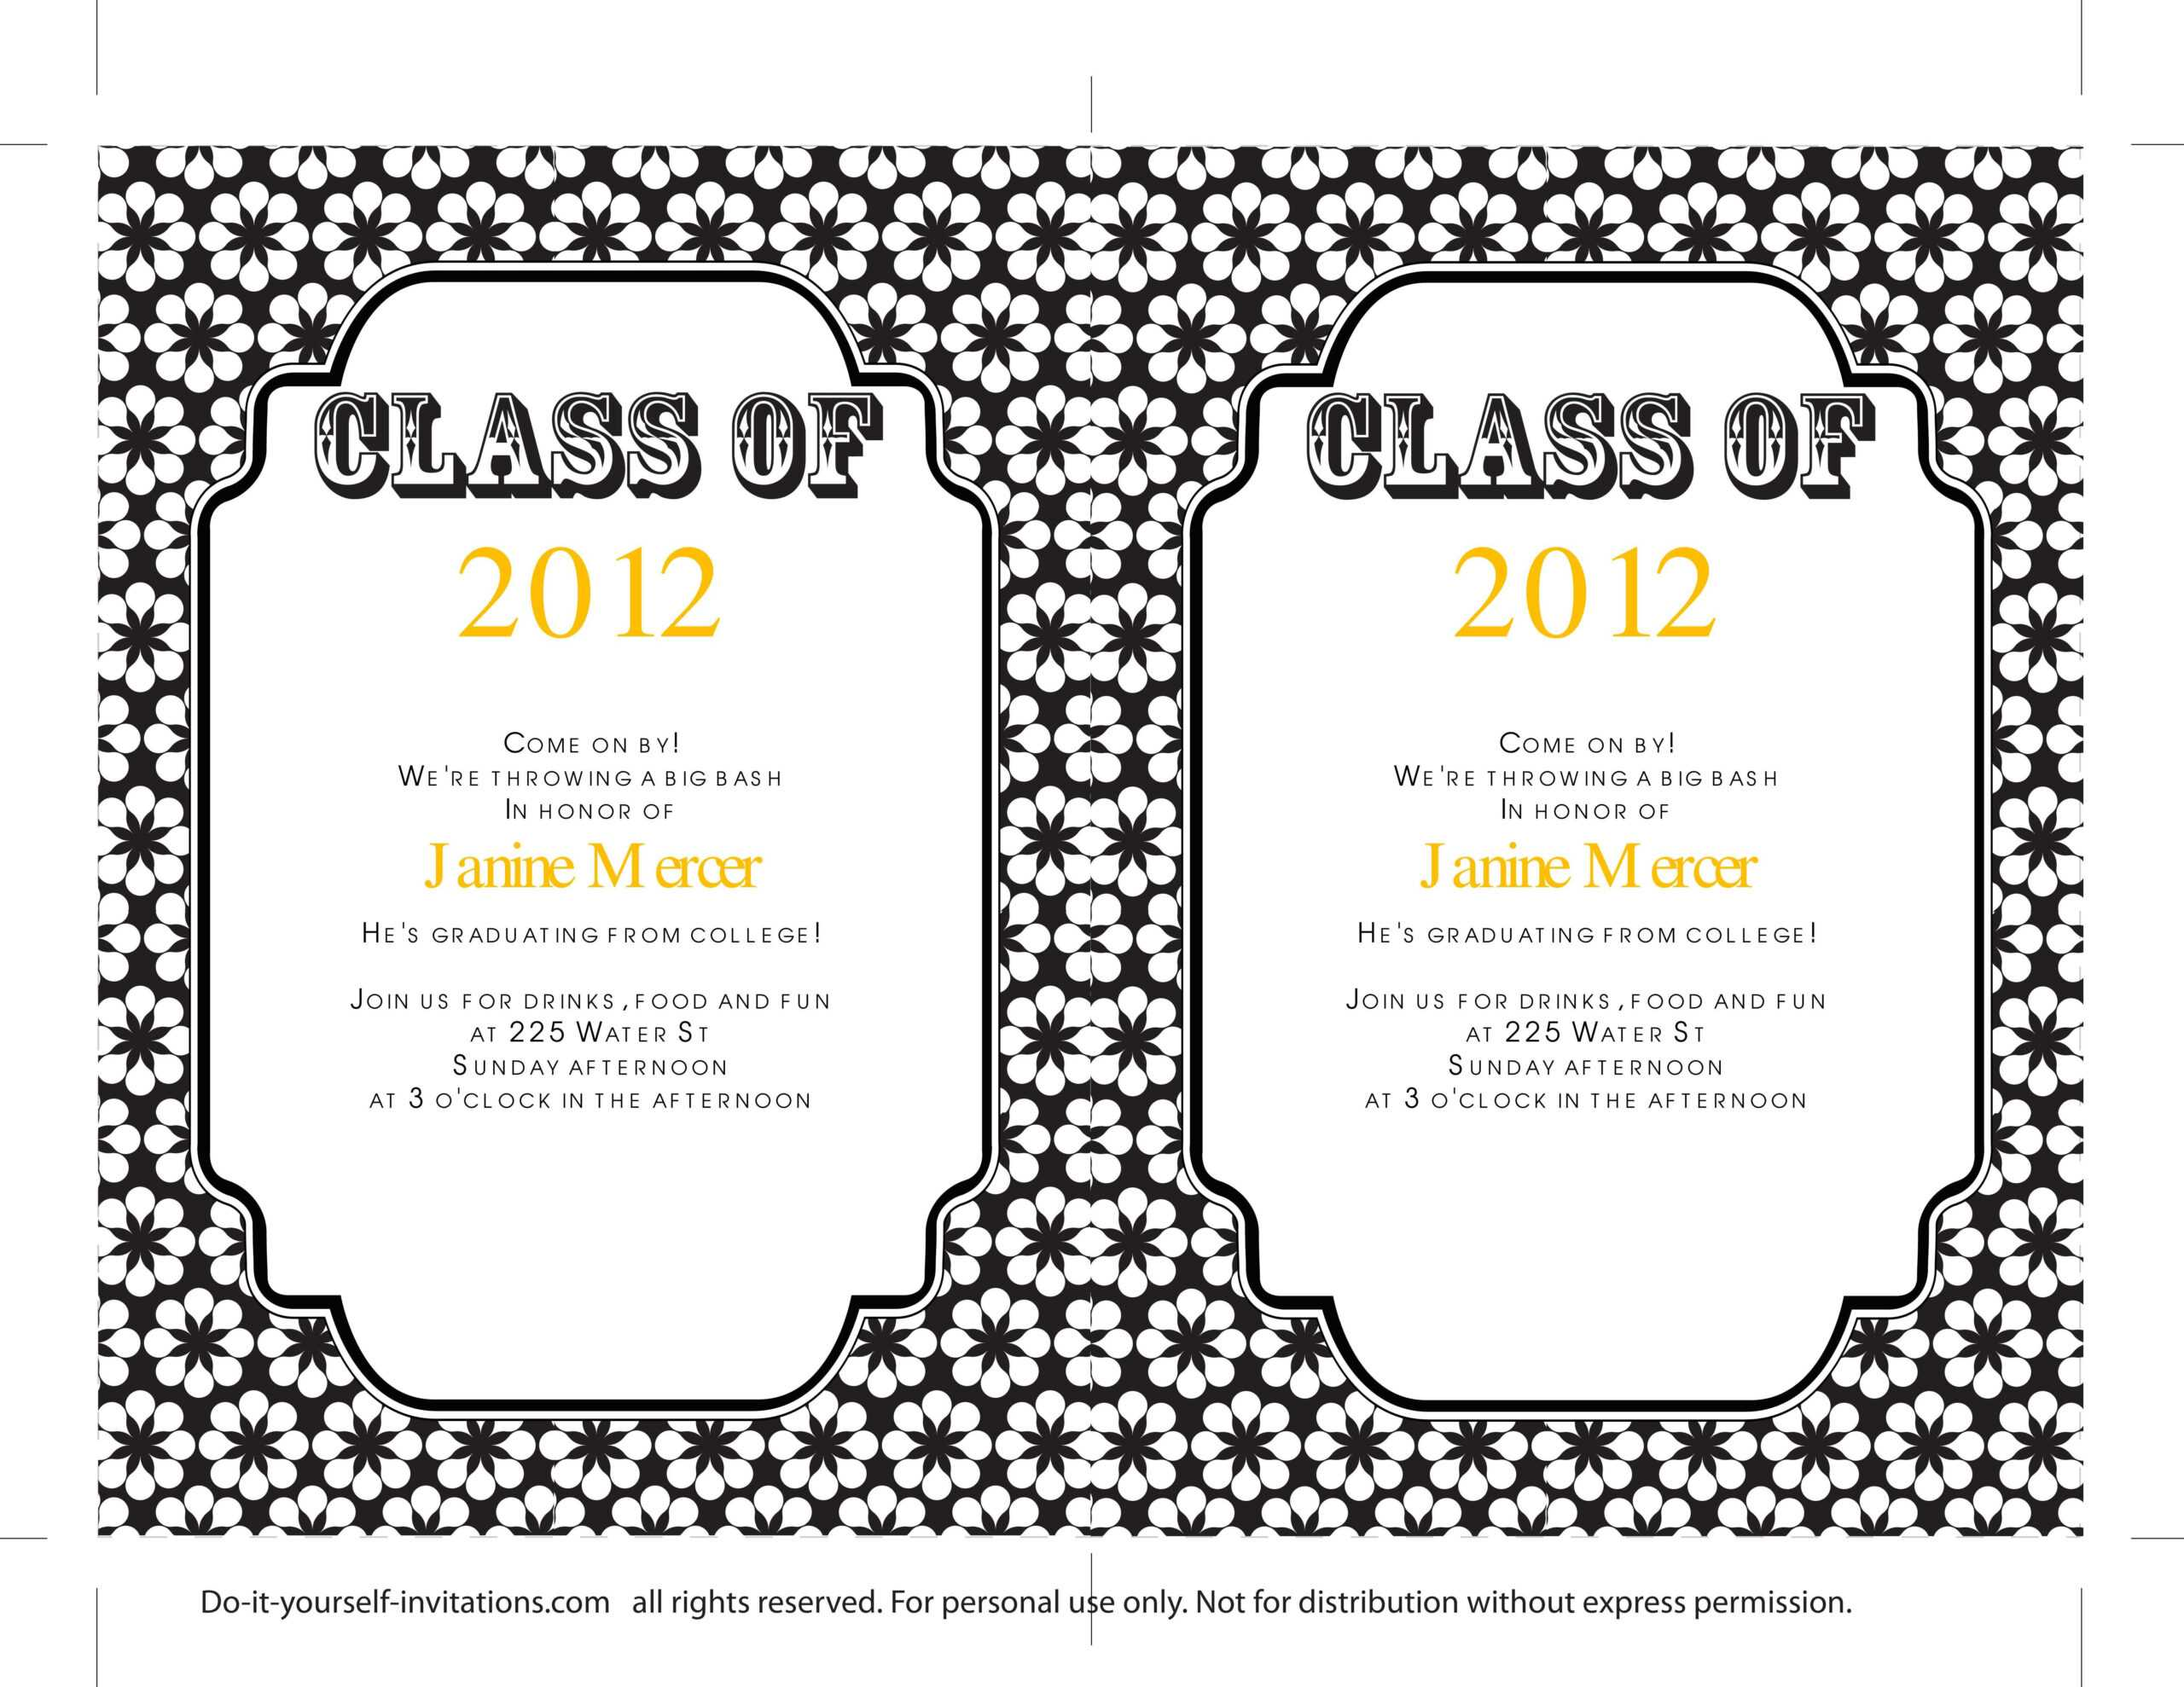 40+ Free Graduation Invitation Templates ᐅ Templatelab In Free Graduation Invitation Templates For Word